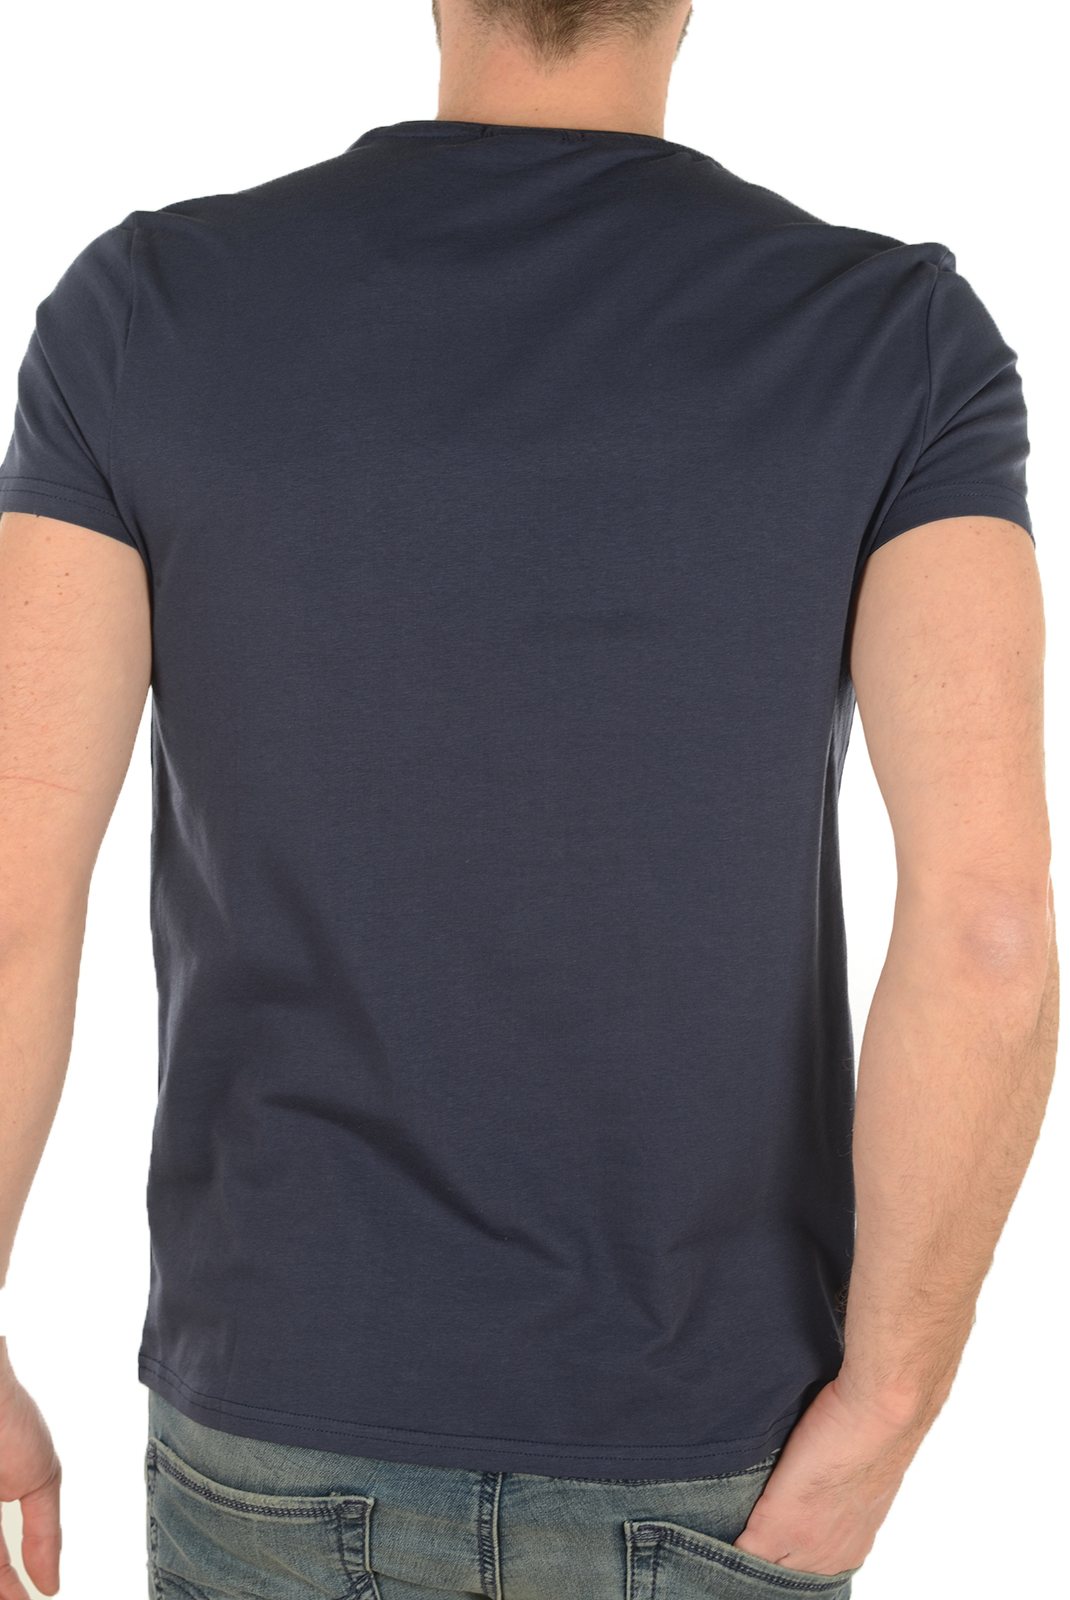 Tee-shirts  Redskins HERACLES CALDER H16 DARK NAVY